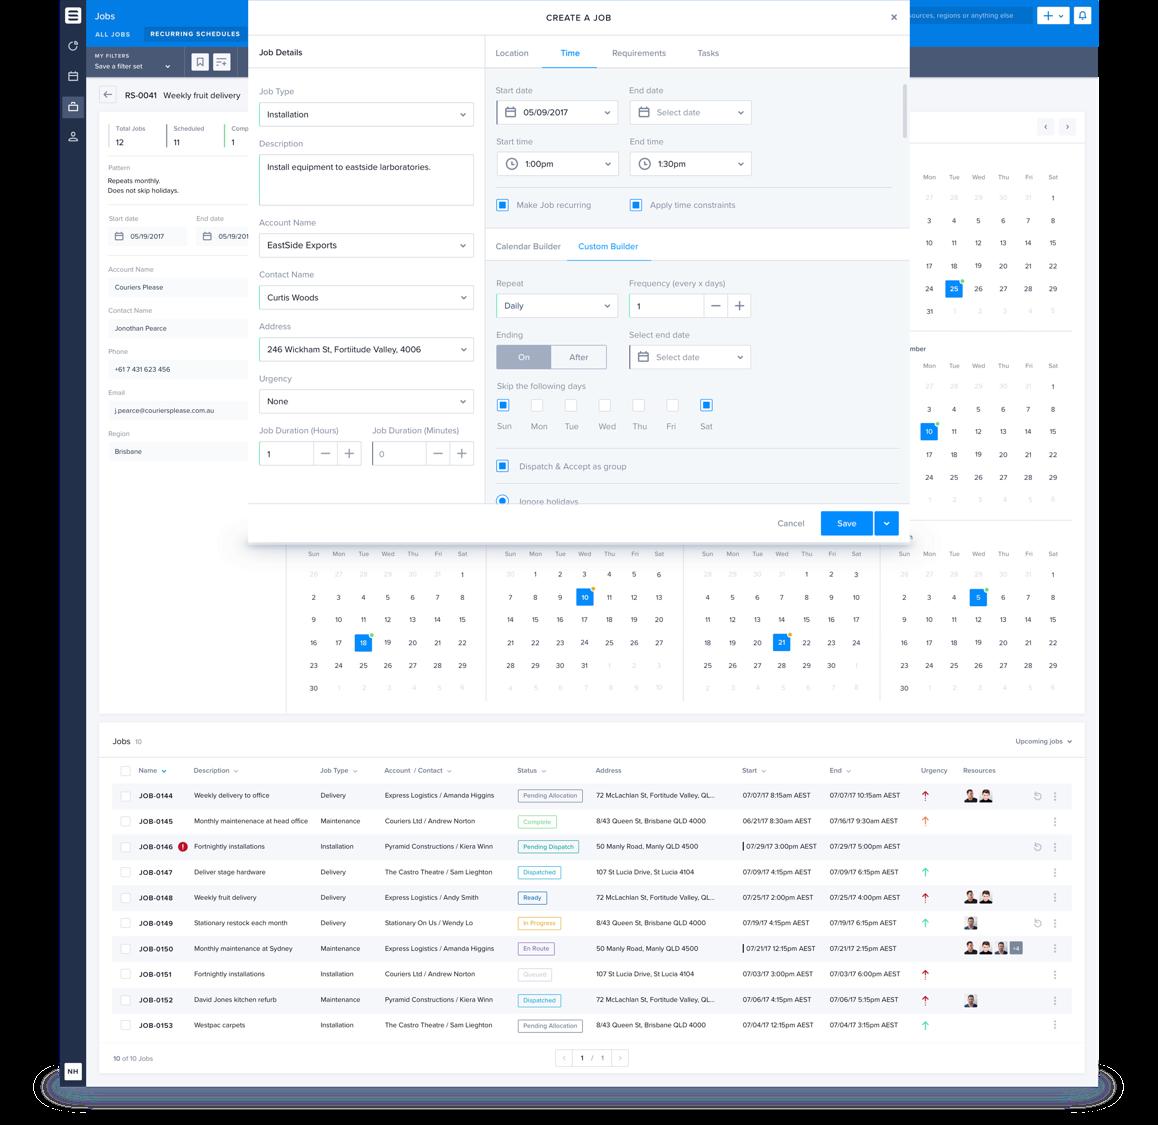 Skedulo Demo - Simplify Complex Scheduling with Clean Visuals